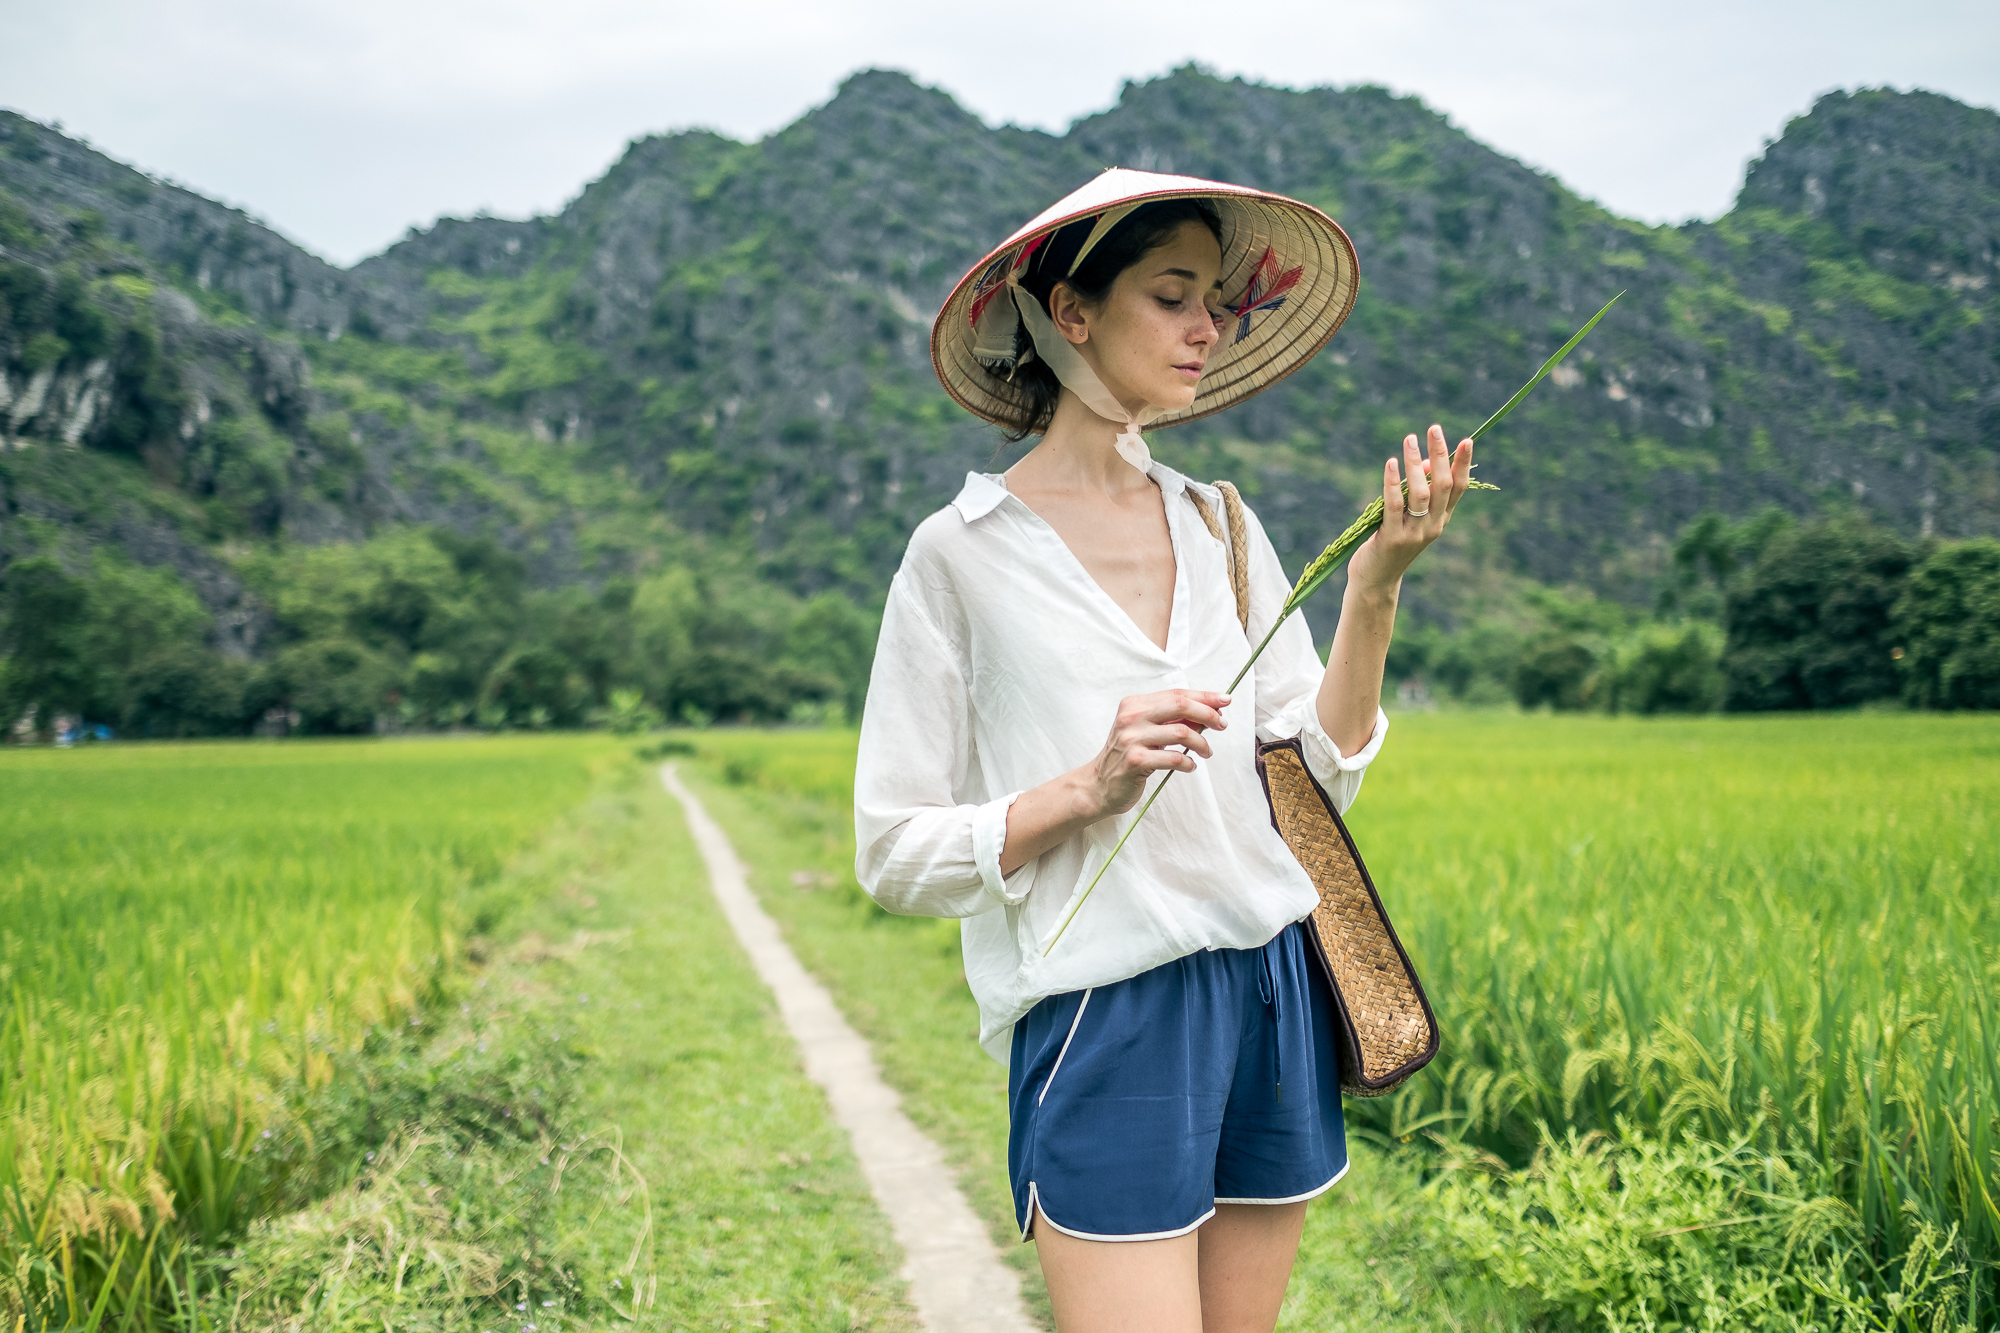 Vietnam_Honeymoon_TheOutsiderBlog_DSCF8676.JPG